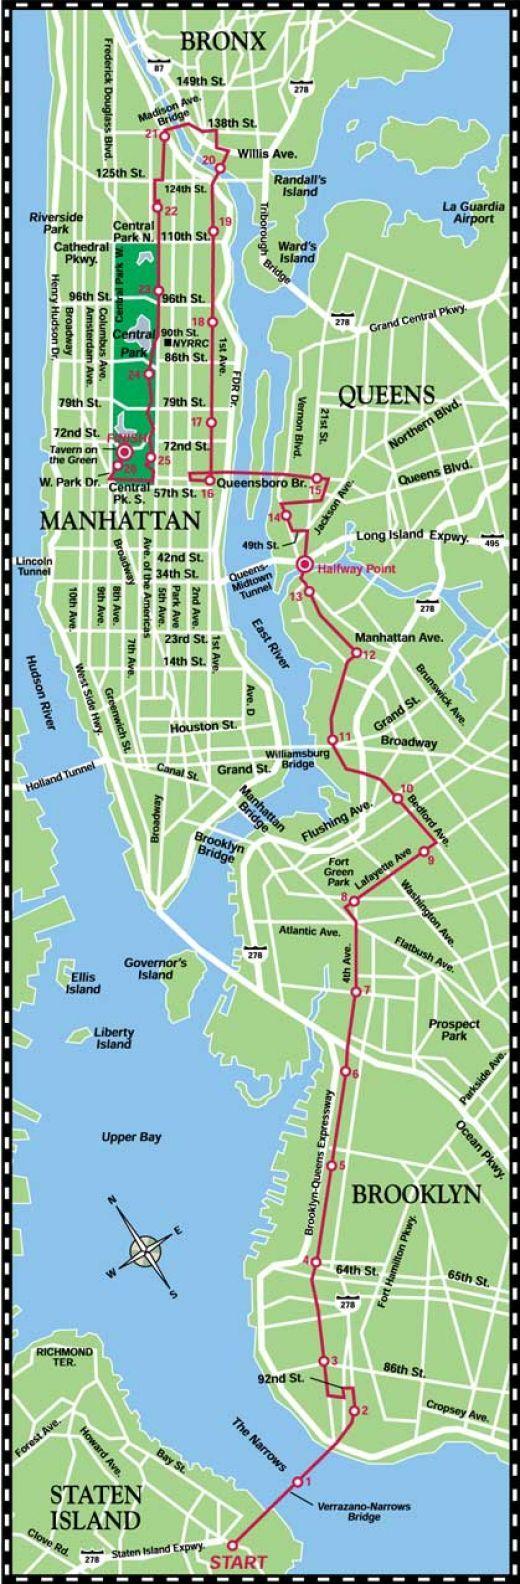 NYC marathon, the only real marathon I'd like to run (besides potentially big sur) bucket list item número uno